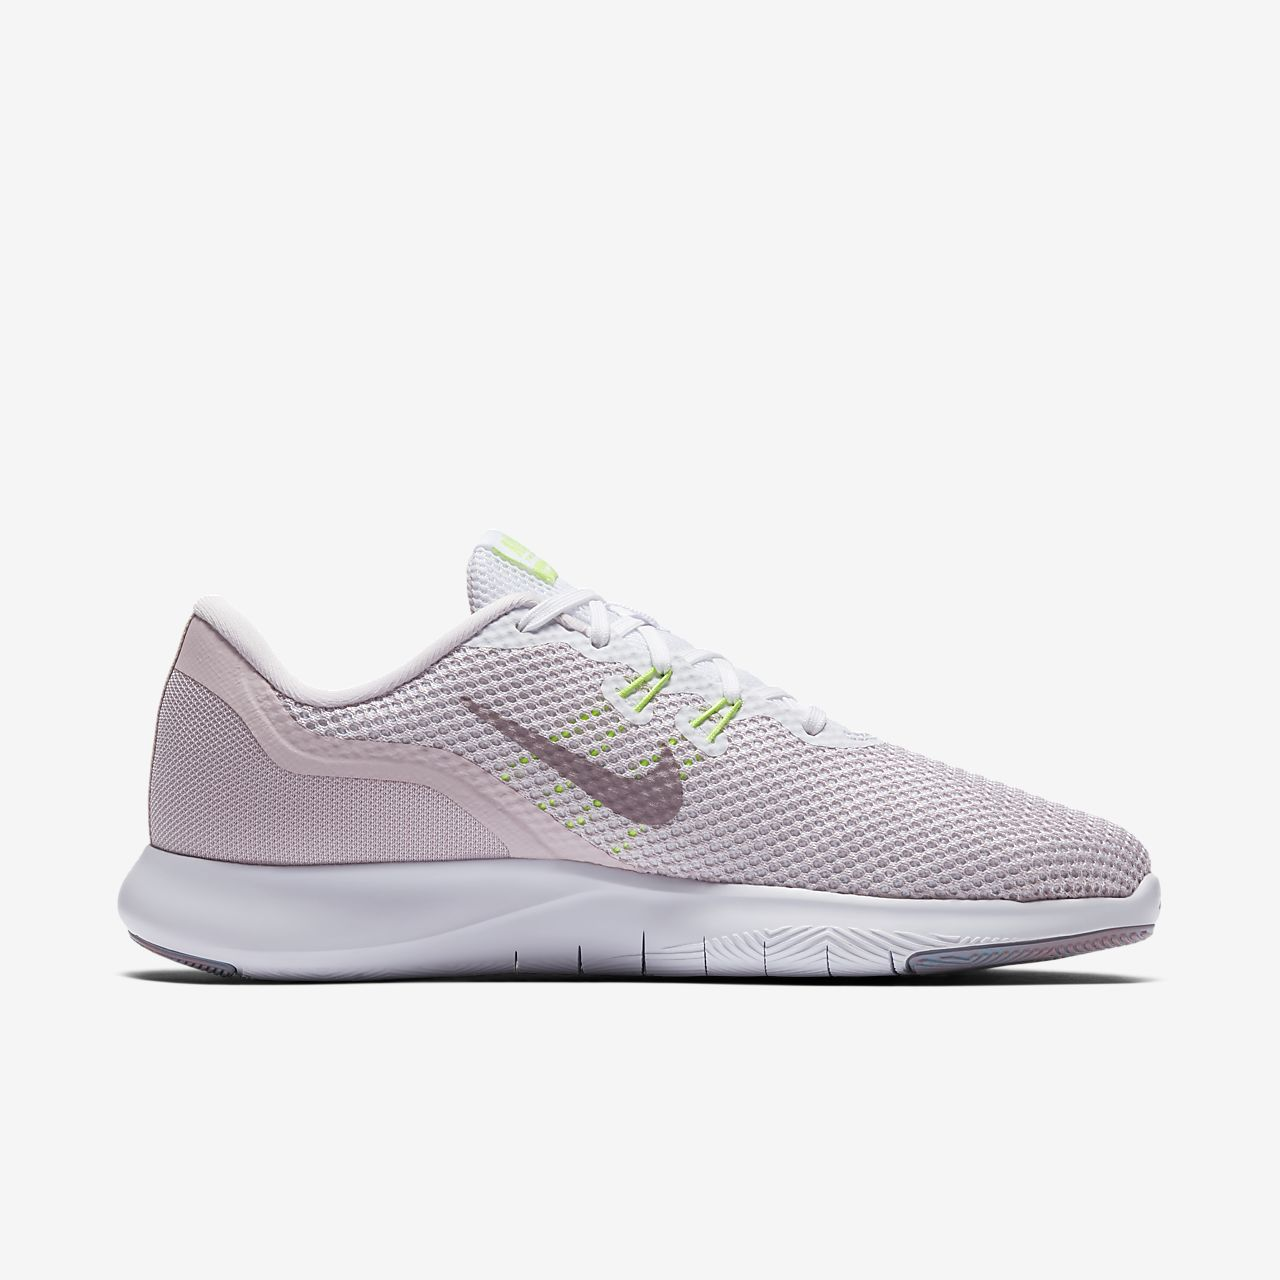 be8314d8 Nike Flex Trainer 7 Women's Gym/Dance/Aerobics Shoe